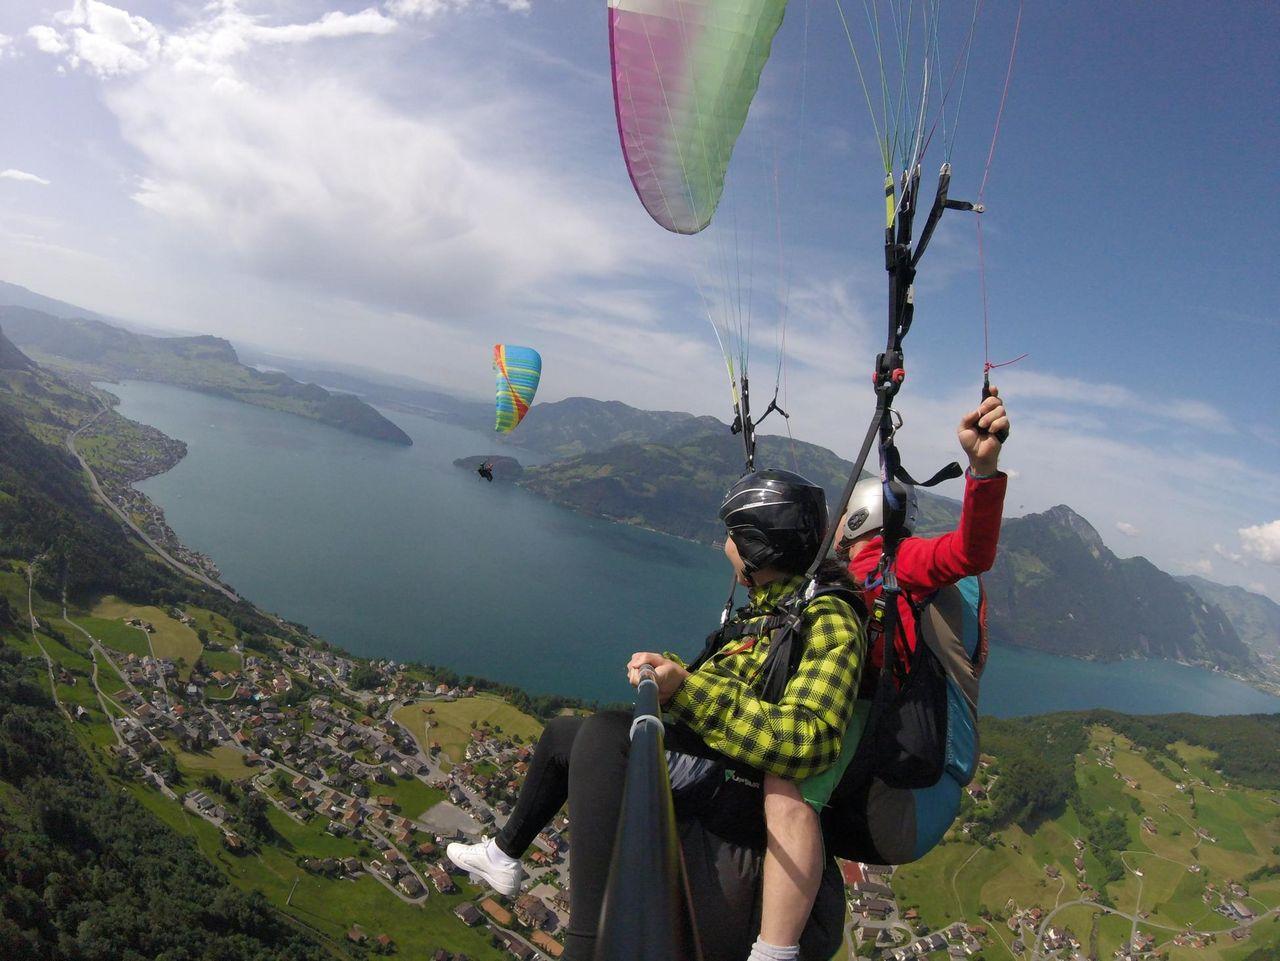 Tandem paragliding – Benno Bachmann